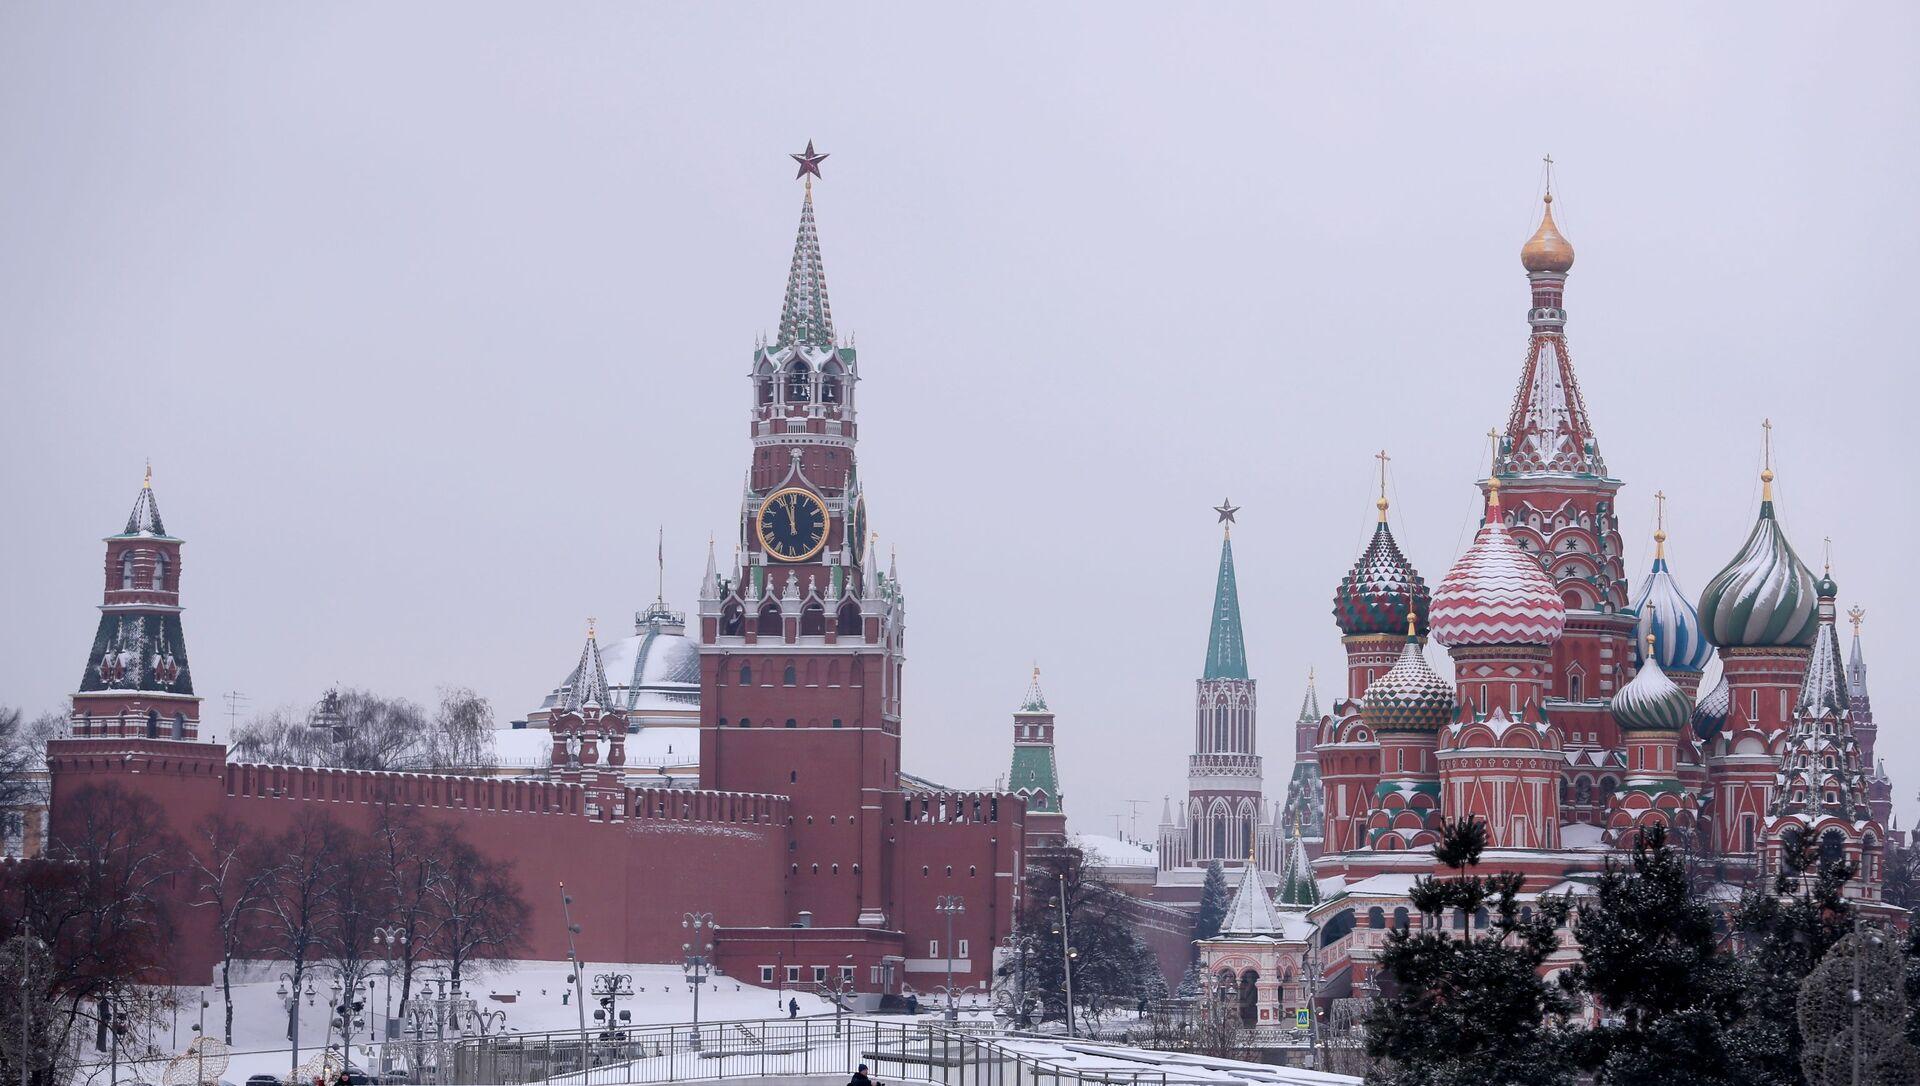 Поглед на московски Кремљ и Спаску кулу - Sputnik Србија, 1920, 16.02.2021